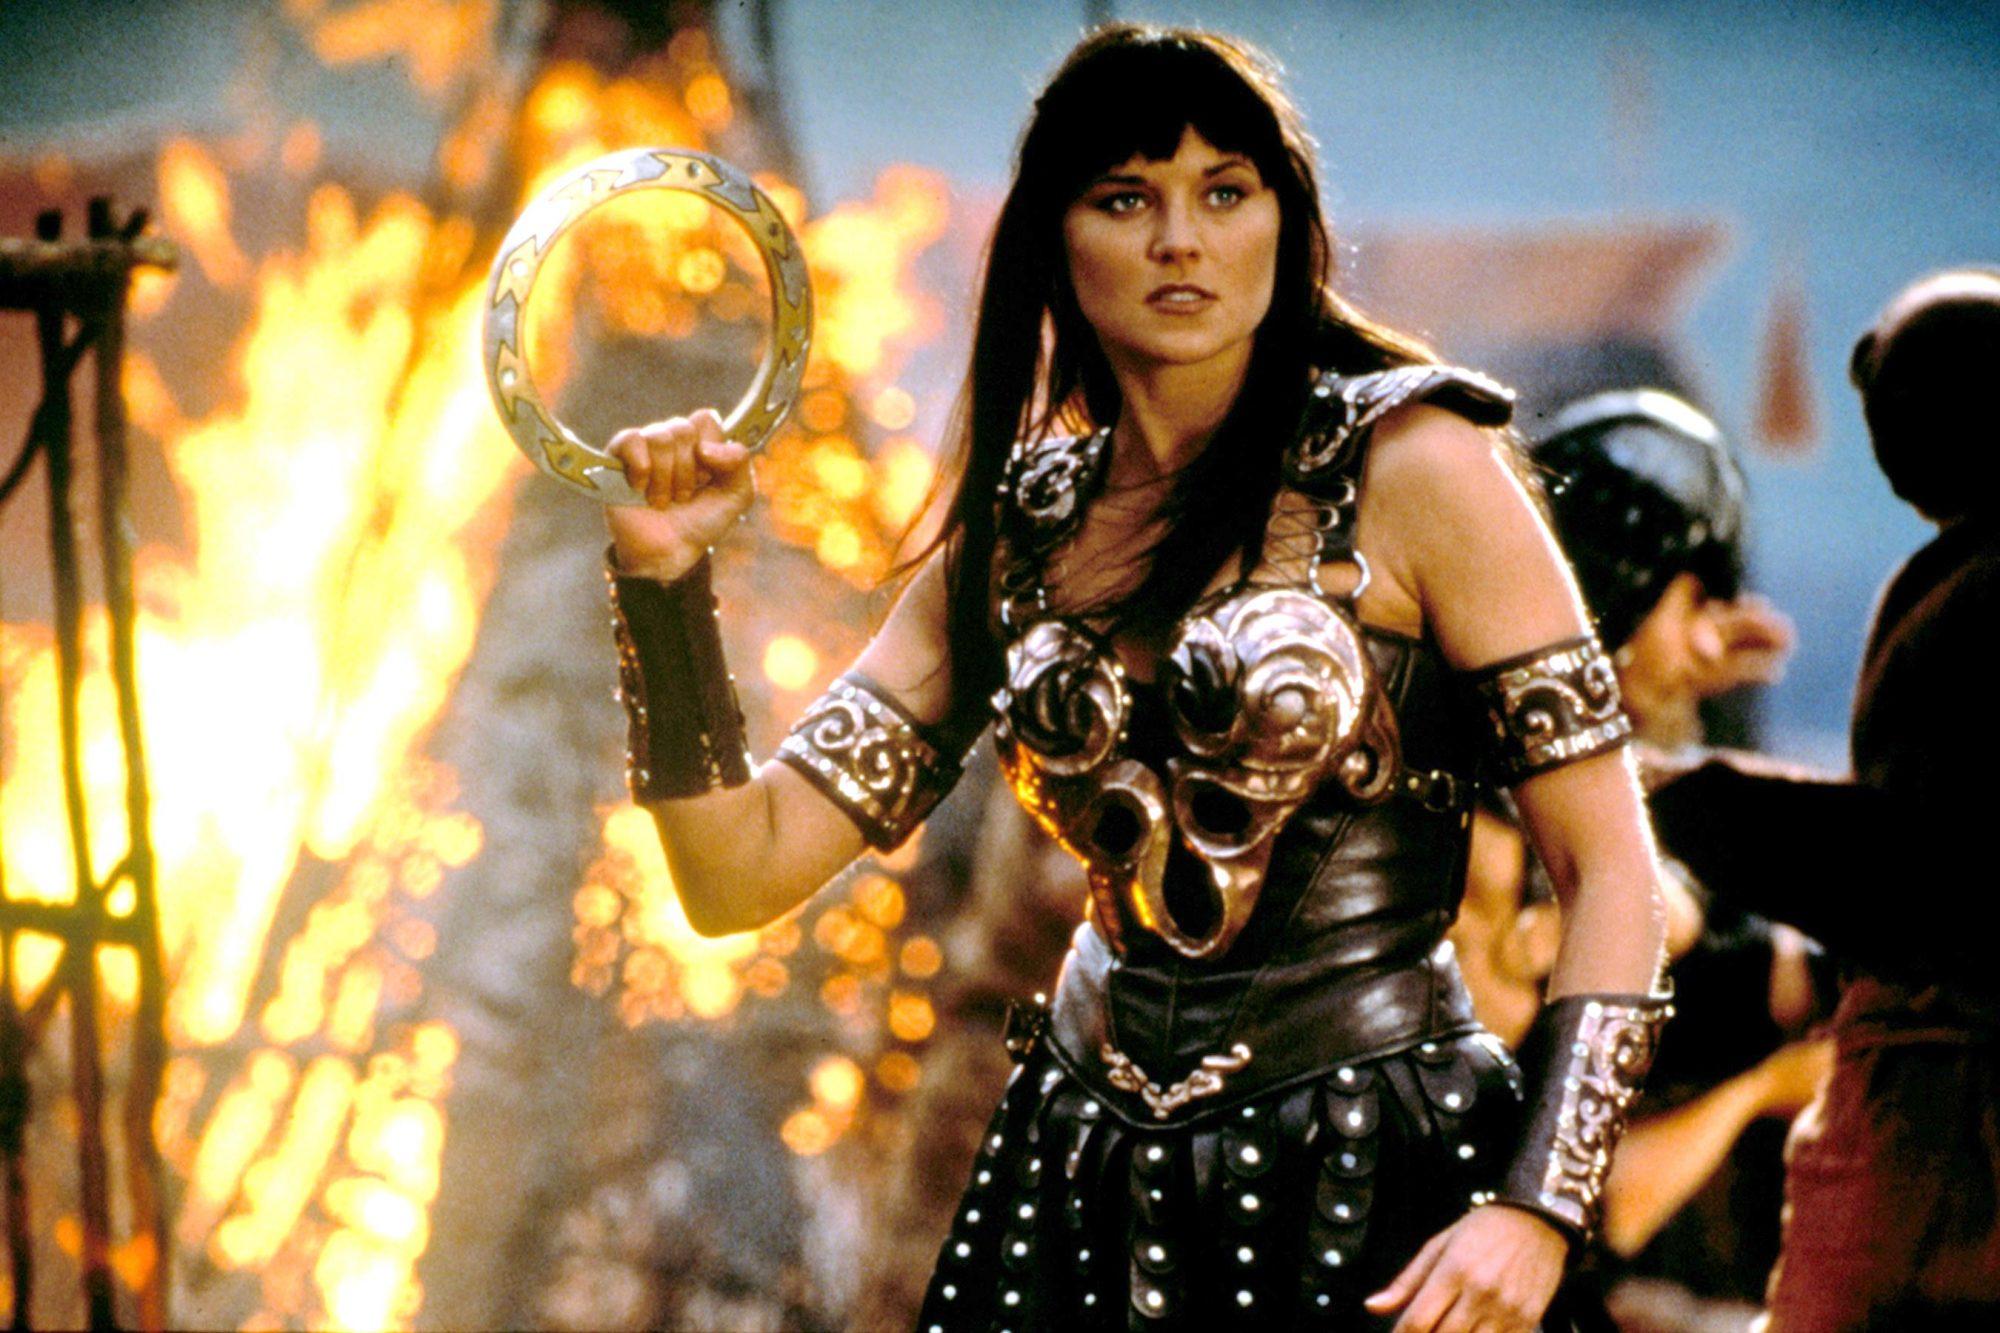 XENA-WARRIOR PRINCESS, Lucy Lawless, Episode: Return Of Callisto, 1995-2001